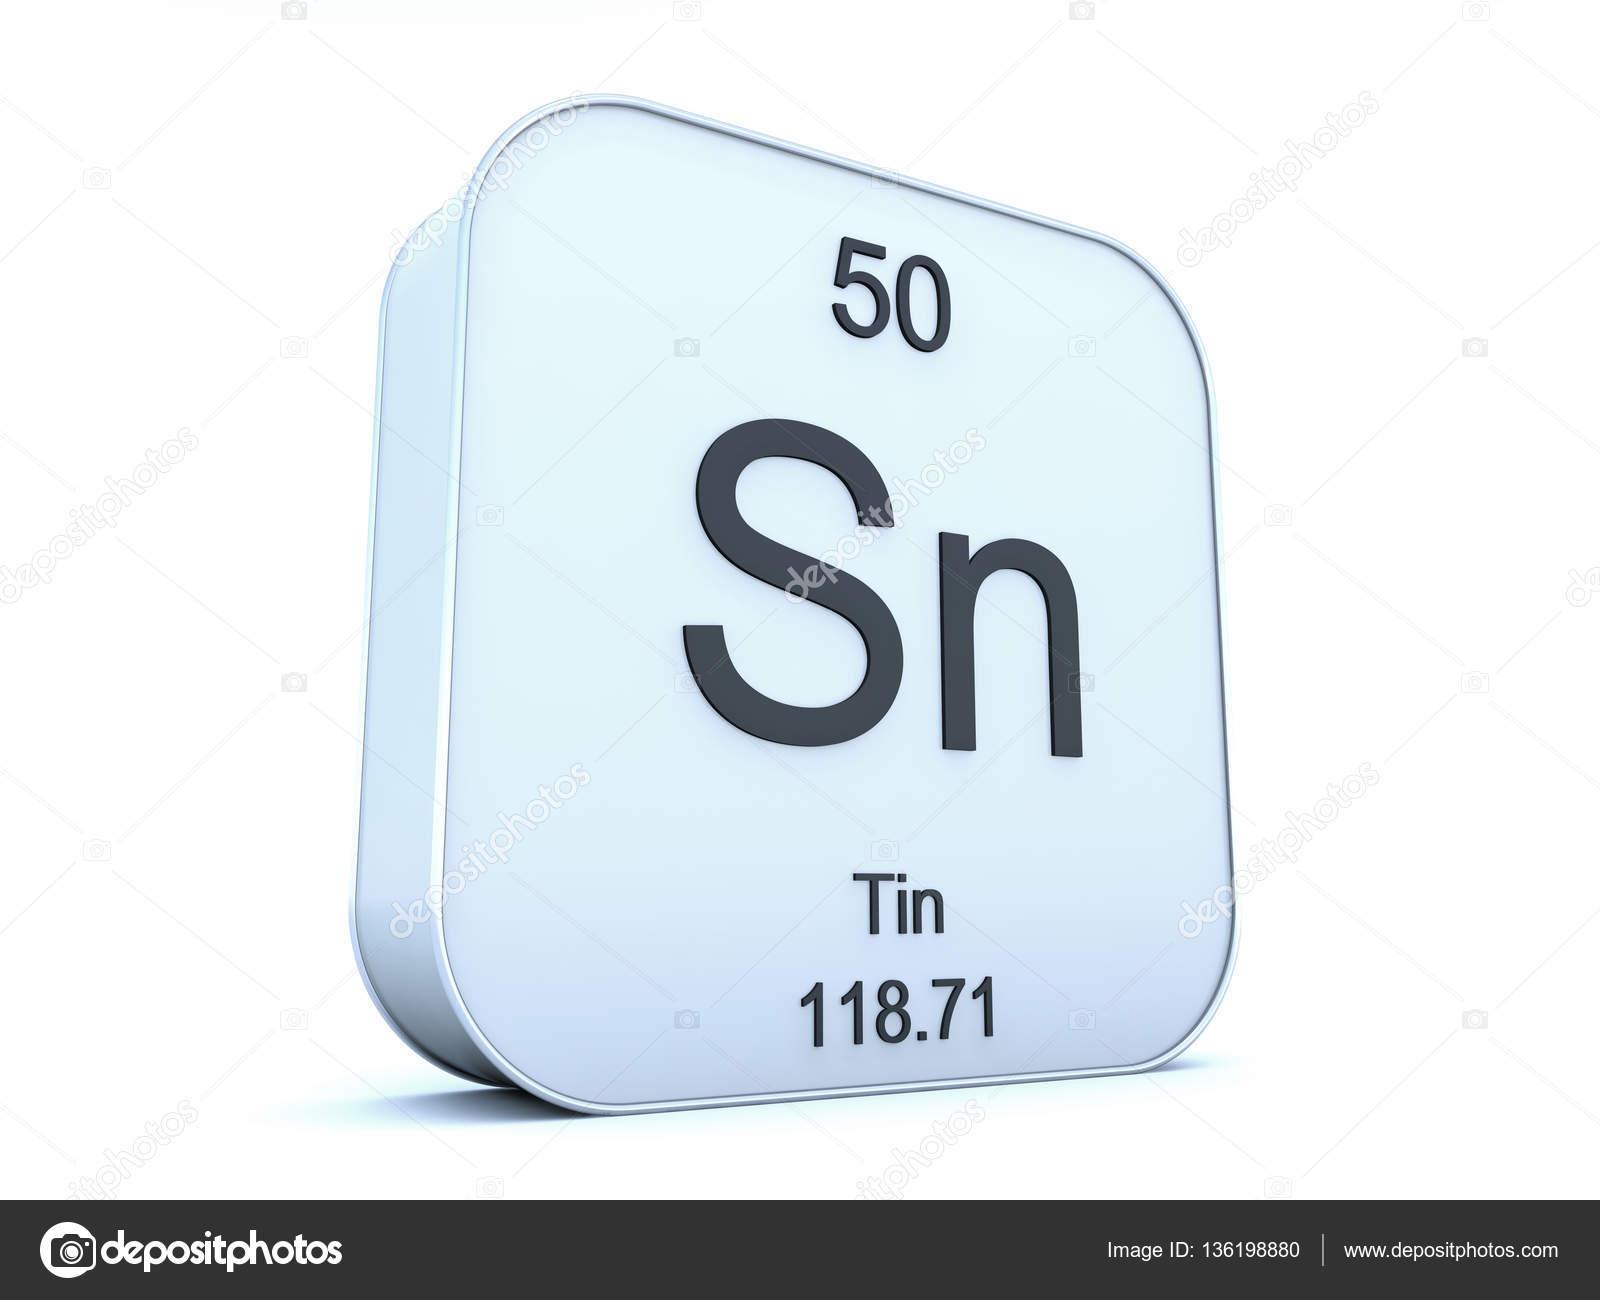 Tin element on white square icon stock photo conceptw 136198880 tin element symbol from the periodic table on white rounded square icon photo by conceptw urtaz Gallery